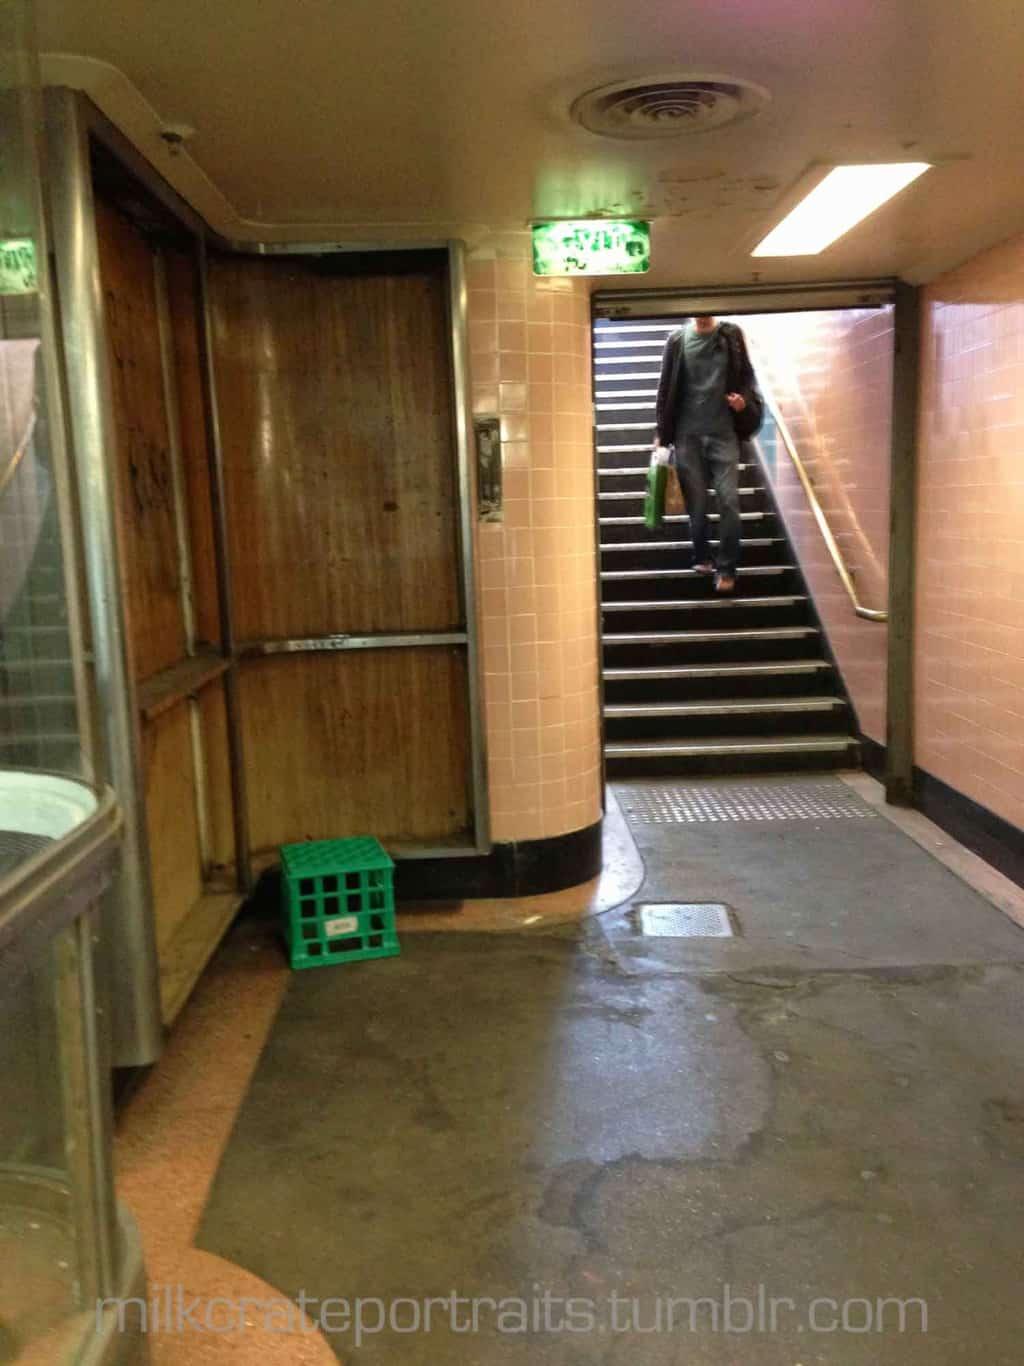 Underneath Flinders St Station